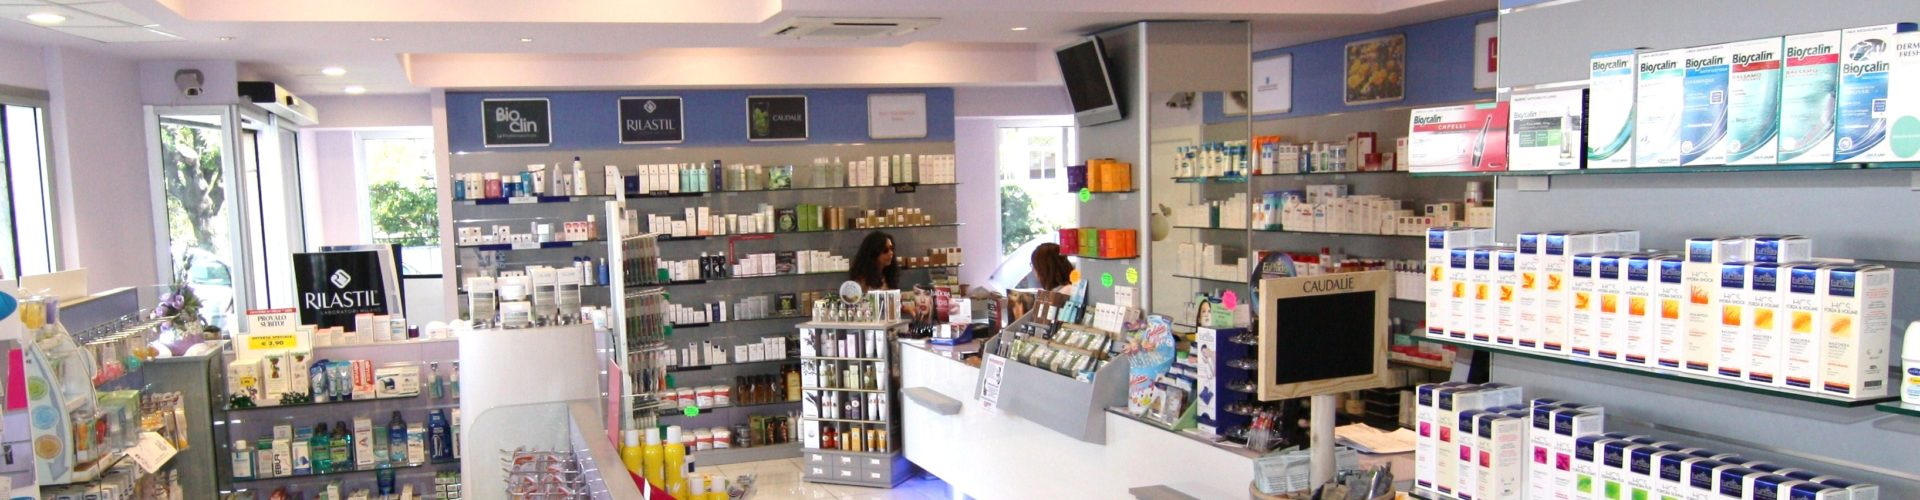 farmacia_silvestro2